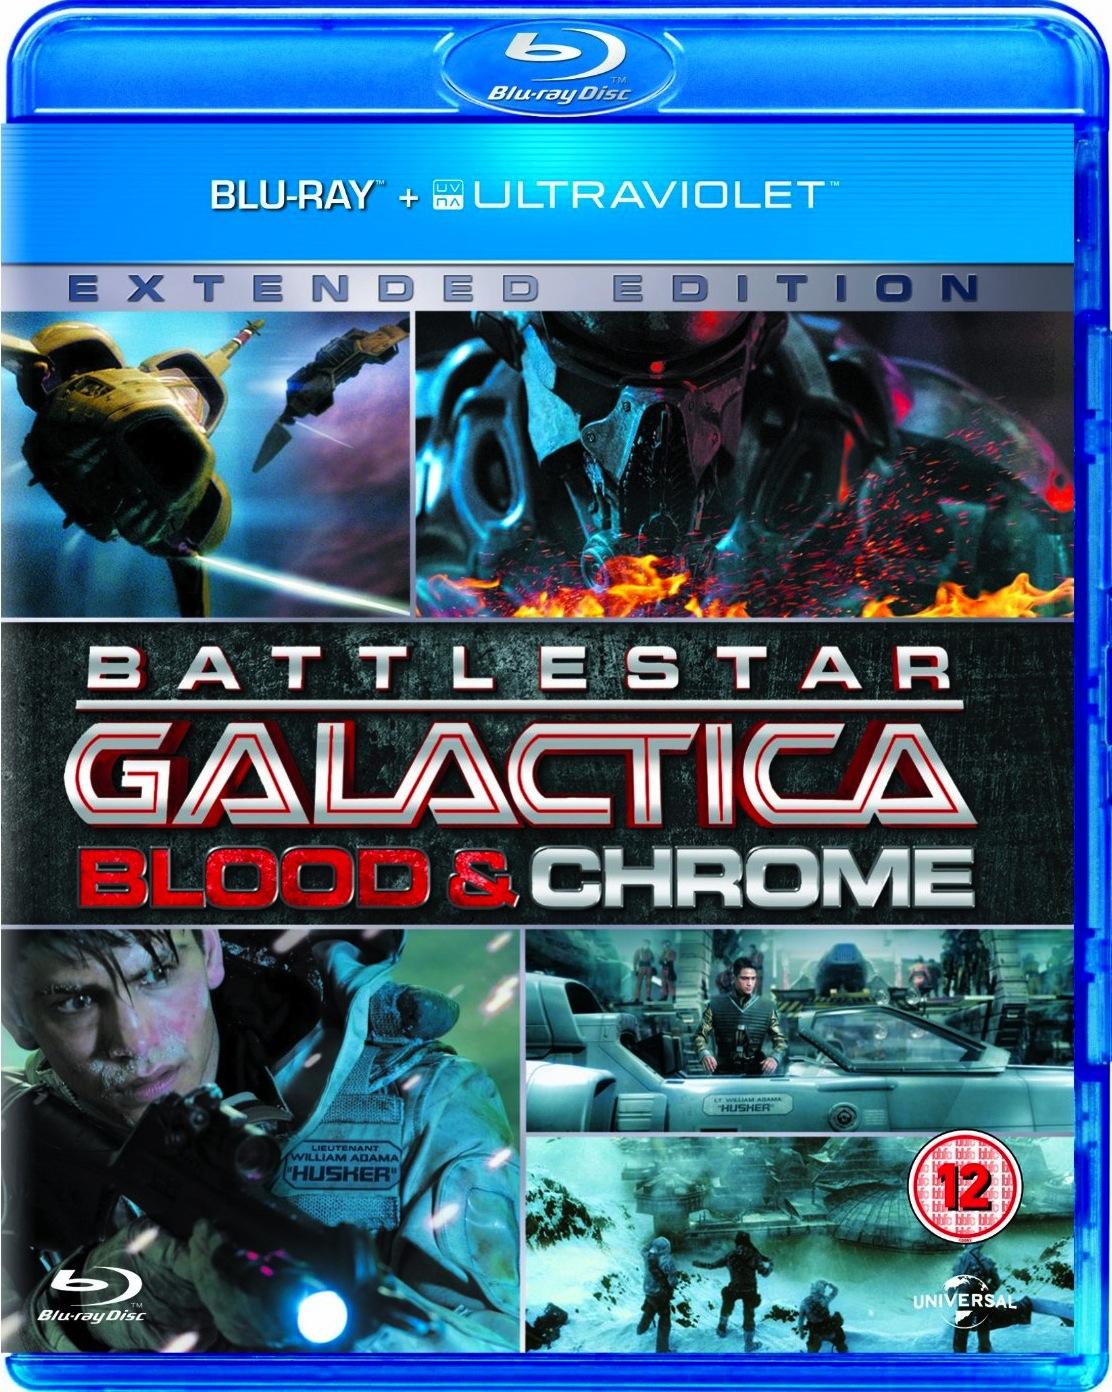 KOOL TV REVIEW: \'BATTLESTAR GALACTICA - BLOOD & CHROME\' BLU-RAY ...